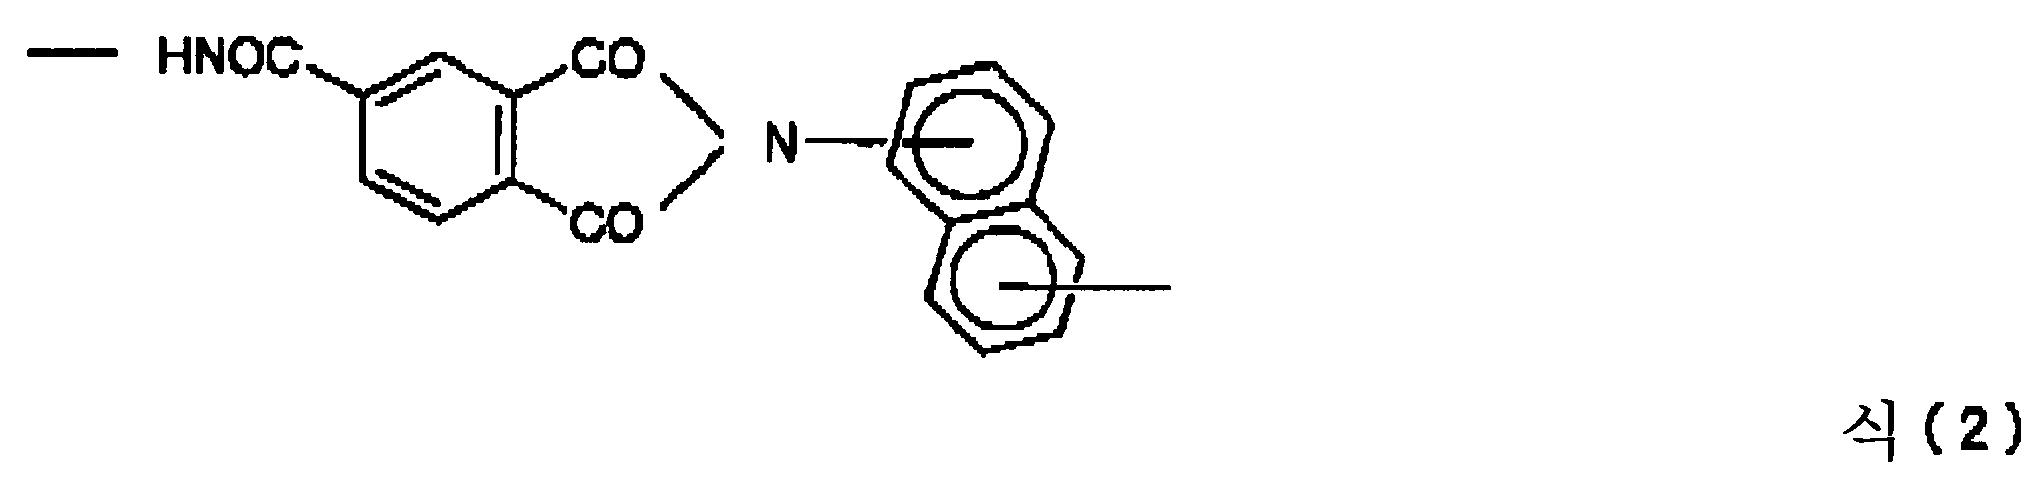 Figure 112001018942212-pat00004